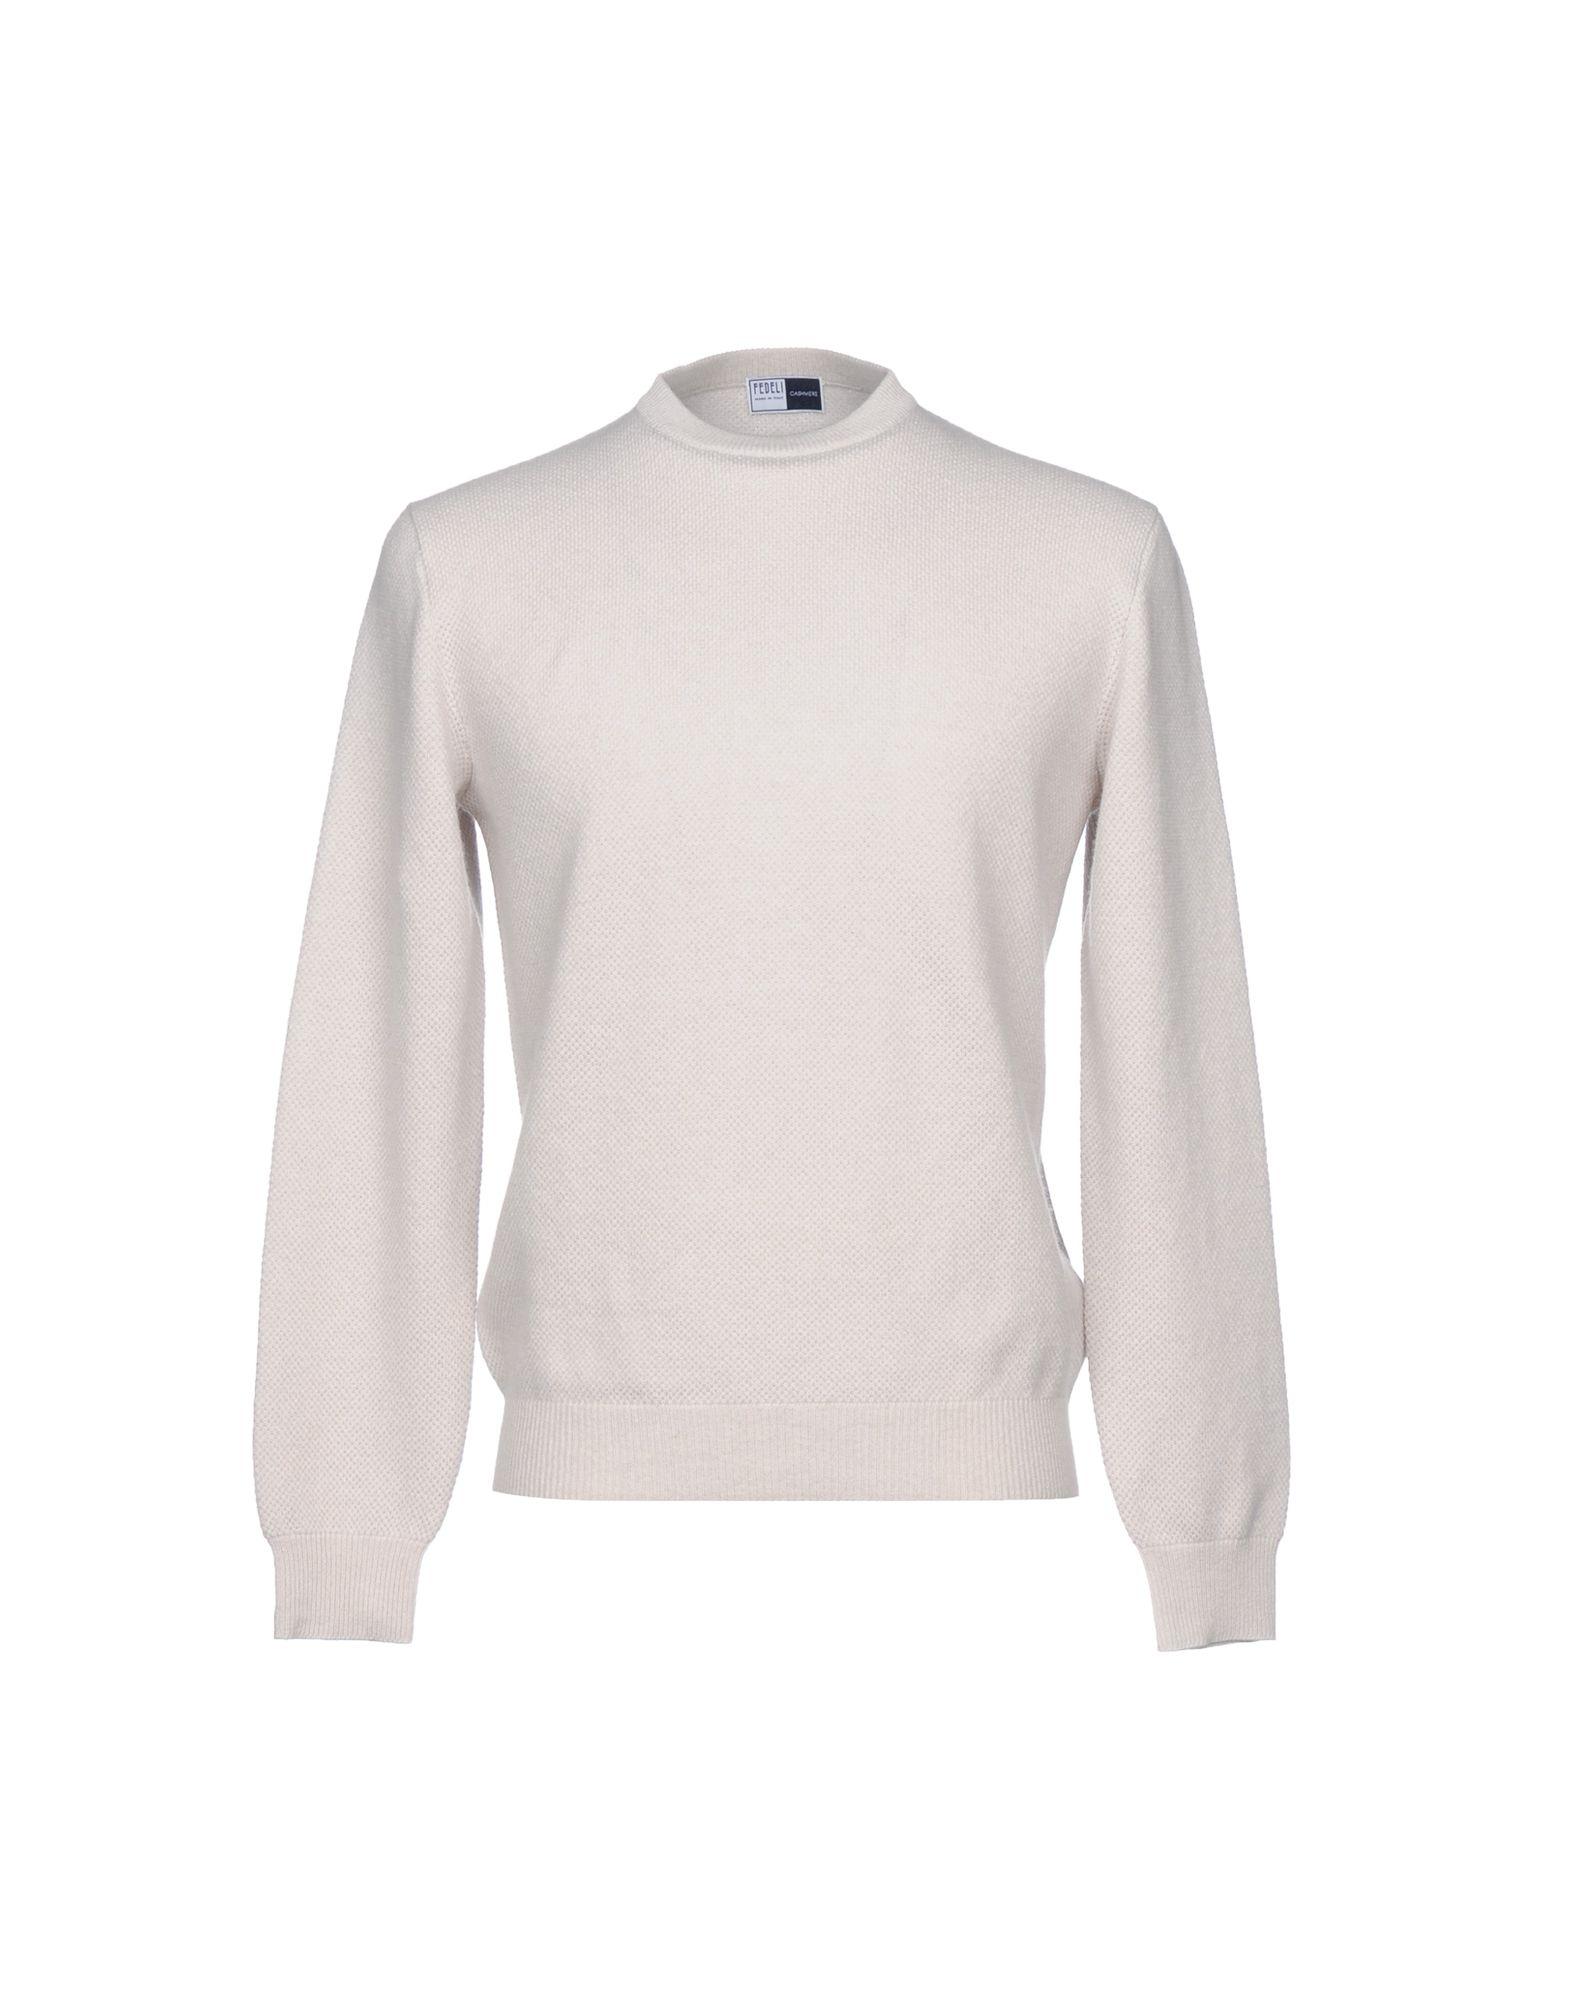 FEDELI Cashmere Blend in Light Grey